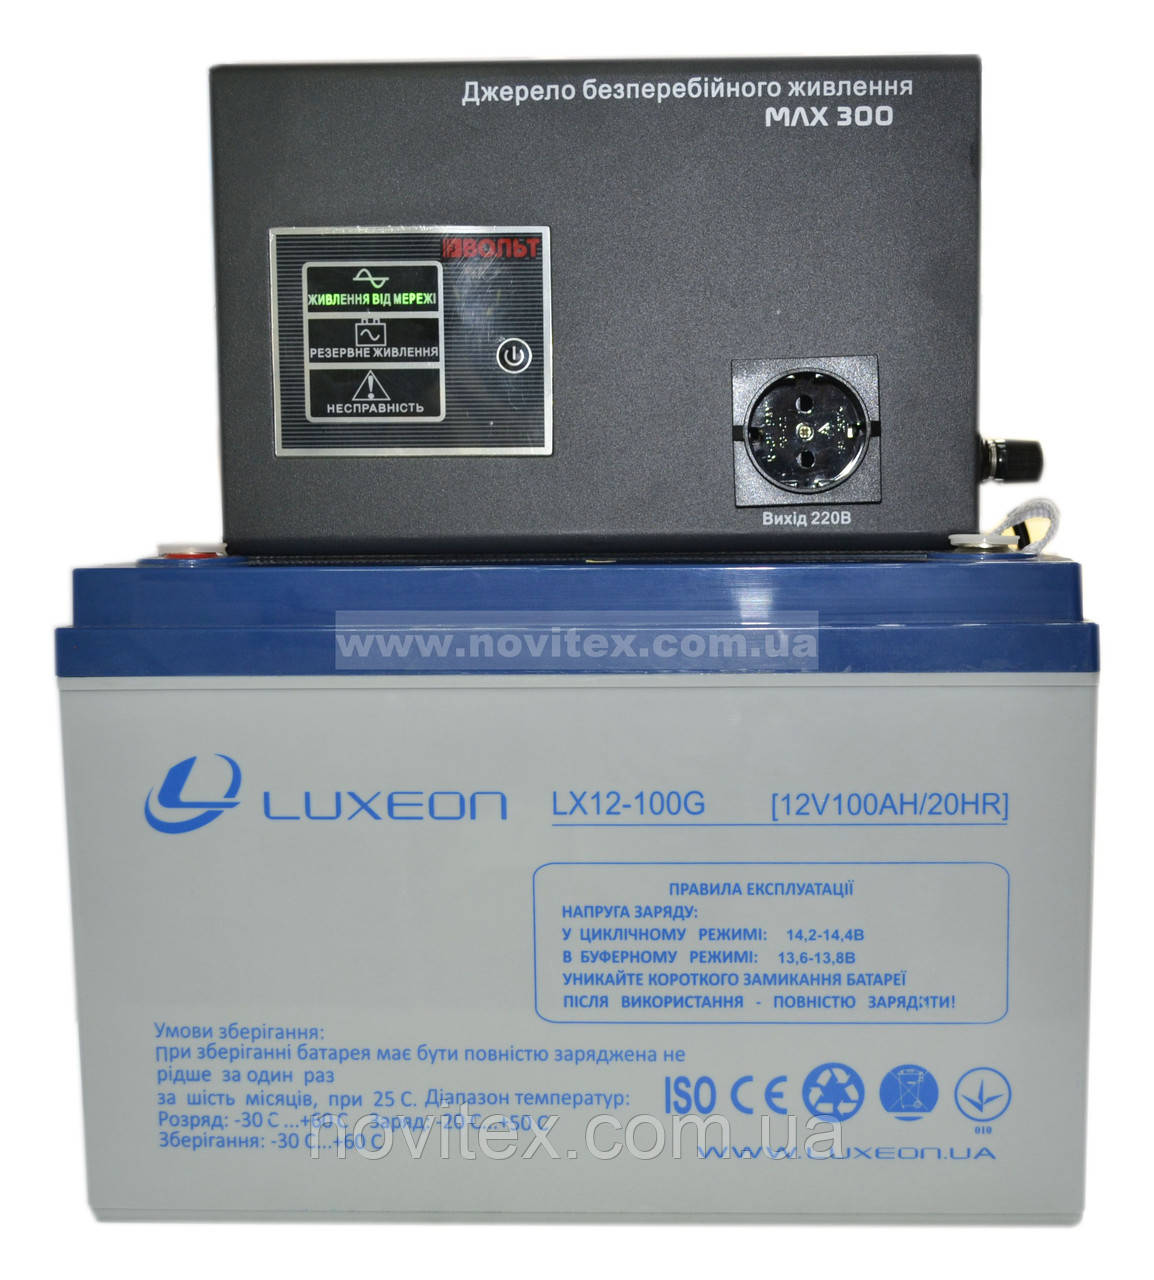 Комплект резервного питания ИБП Вольт MAX-300 + АКБ LX12-100G